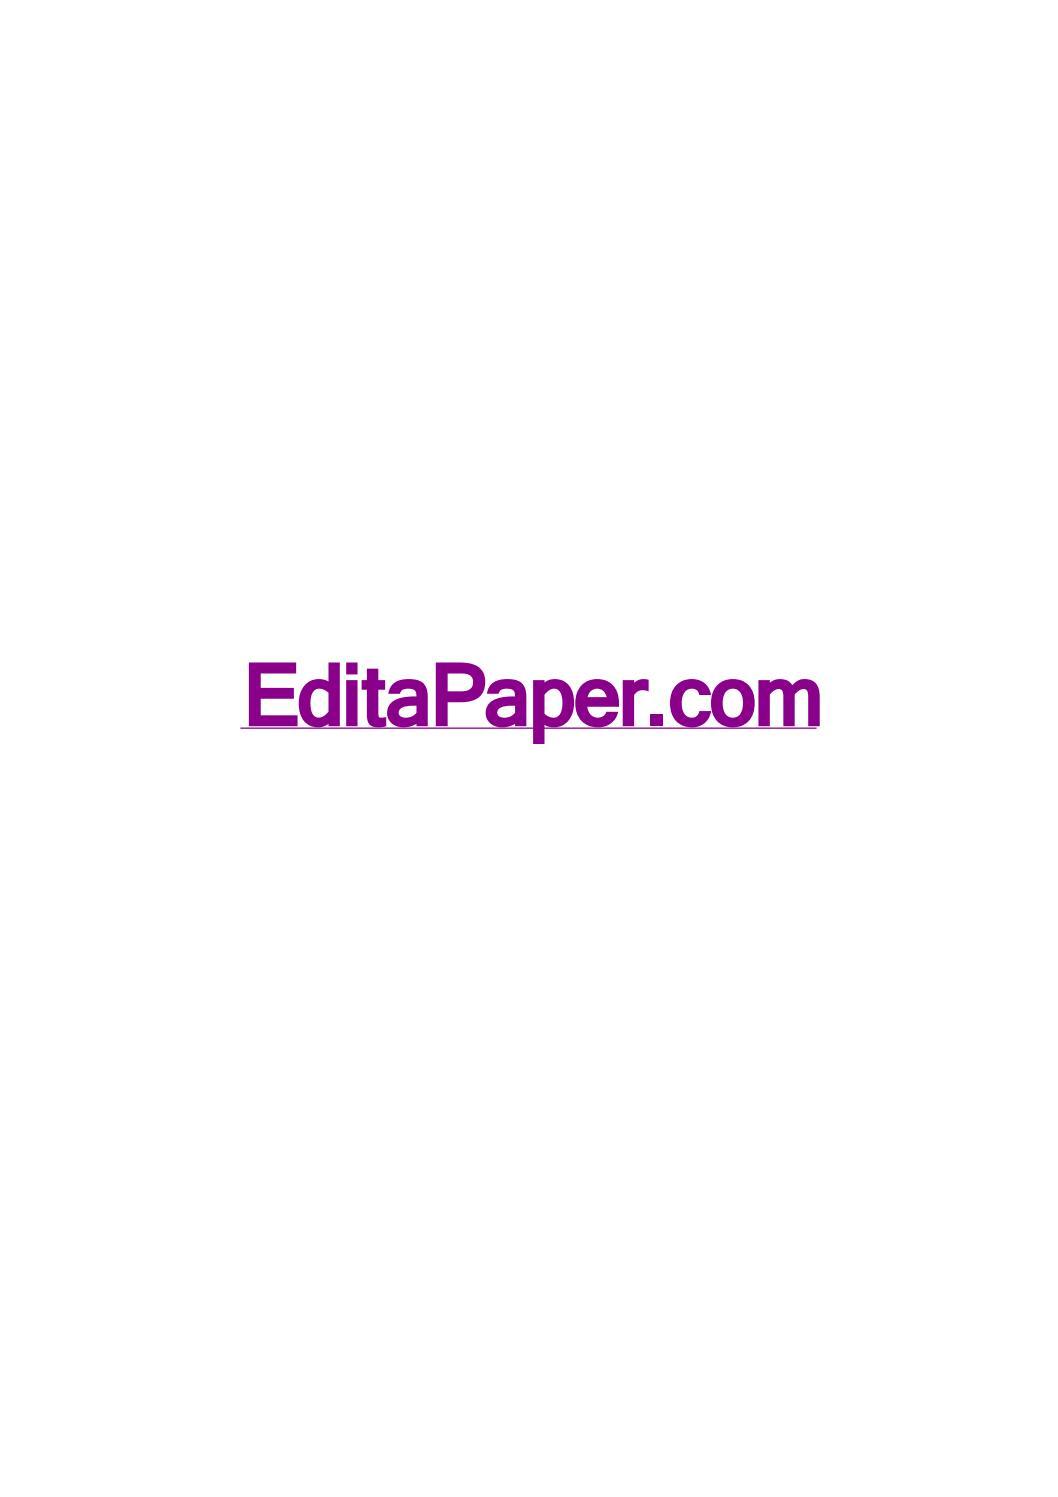 Jessy Erinn Biography essay editing toolcrystaldbfpn - issuu